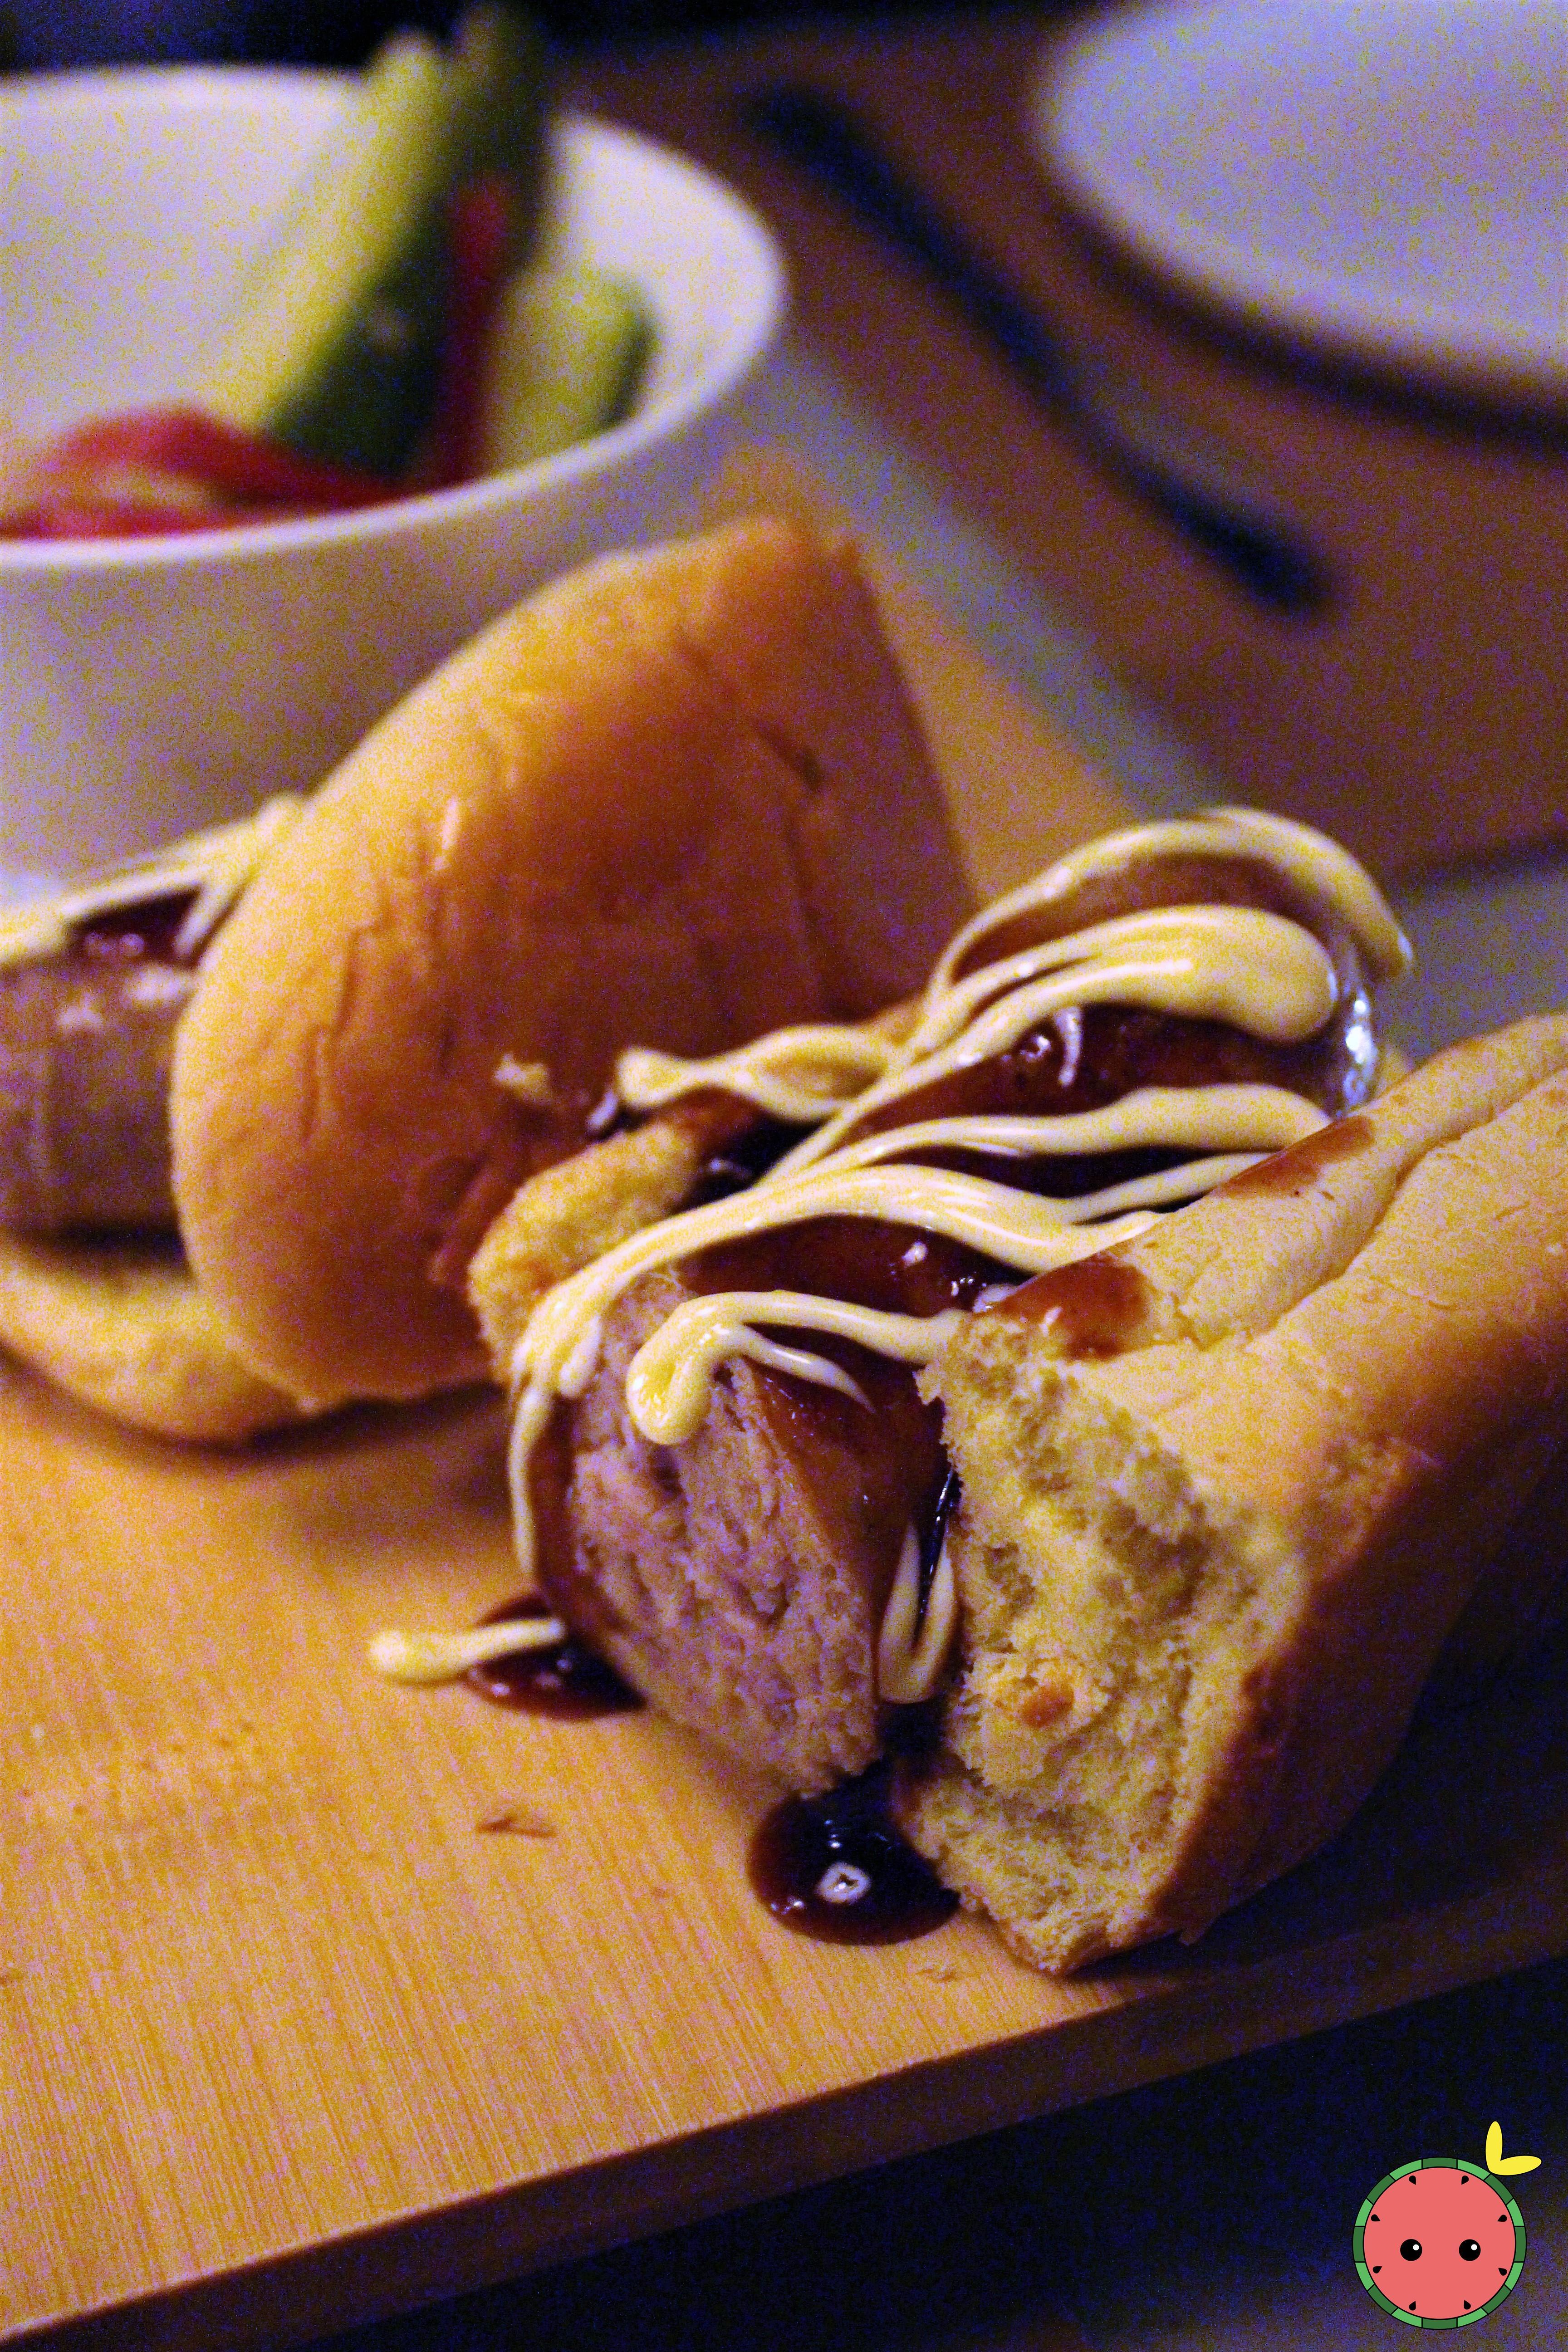 Dinnertable Dog with House Pickles - House miso sausage, potato bun, wasabi pea salt, sauces, and ma